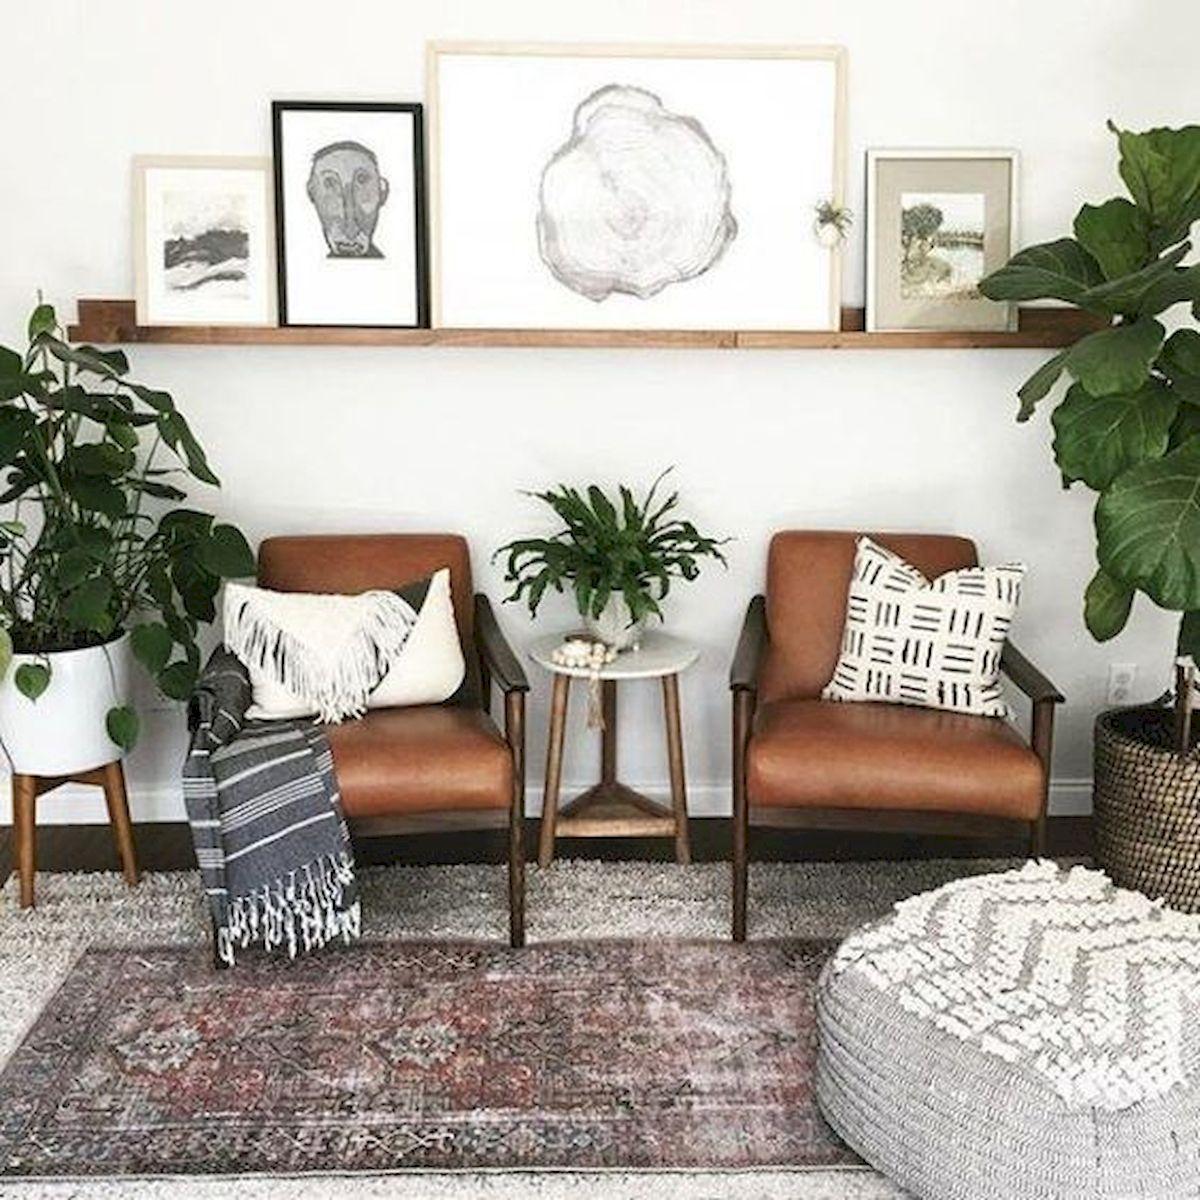 45 Brilliant DIY Living Room Design and Decor Ideas for Small Apartment (7)